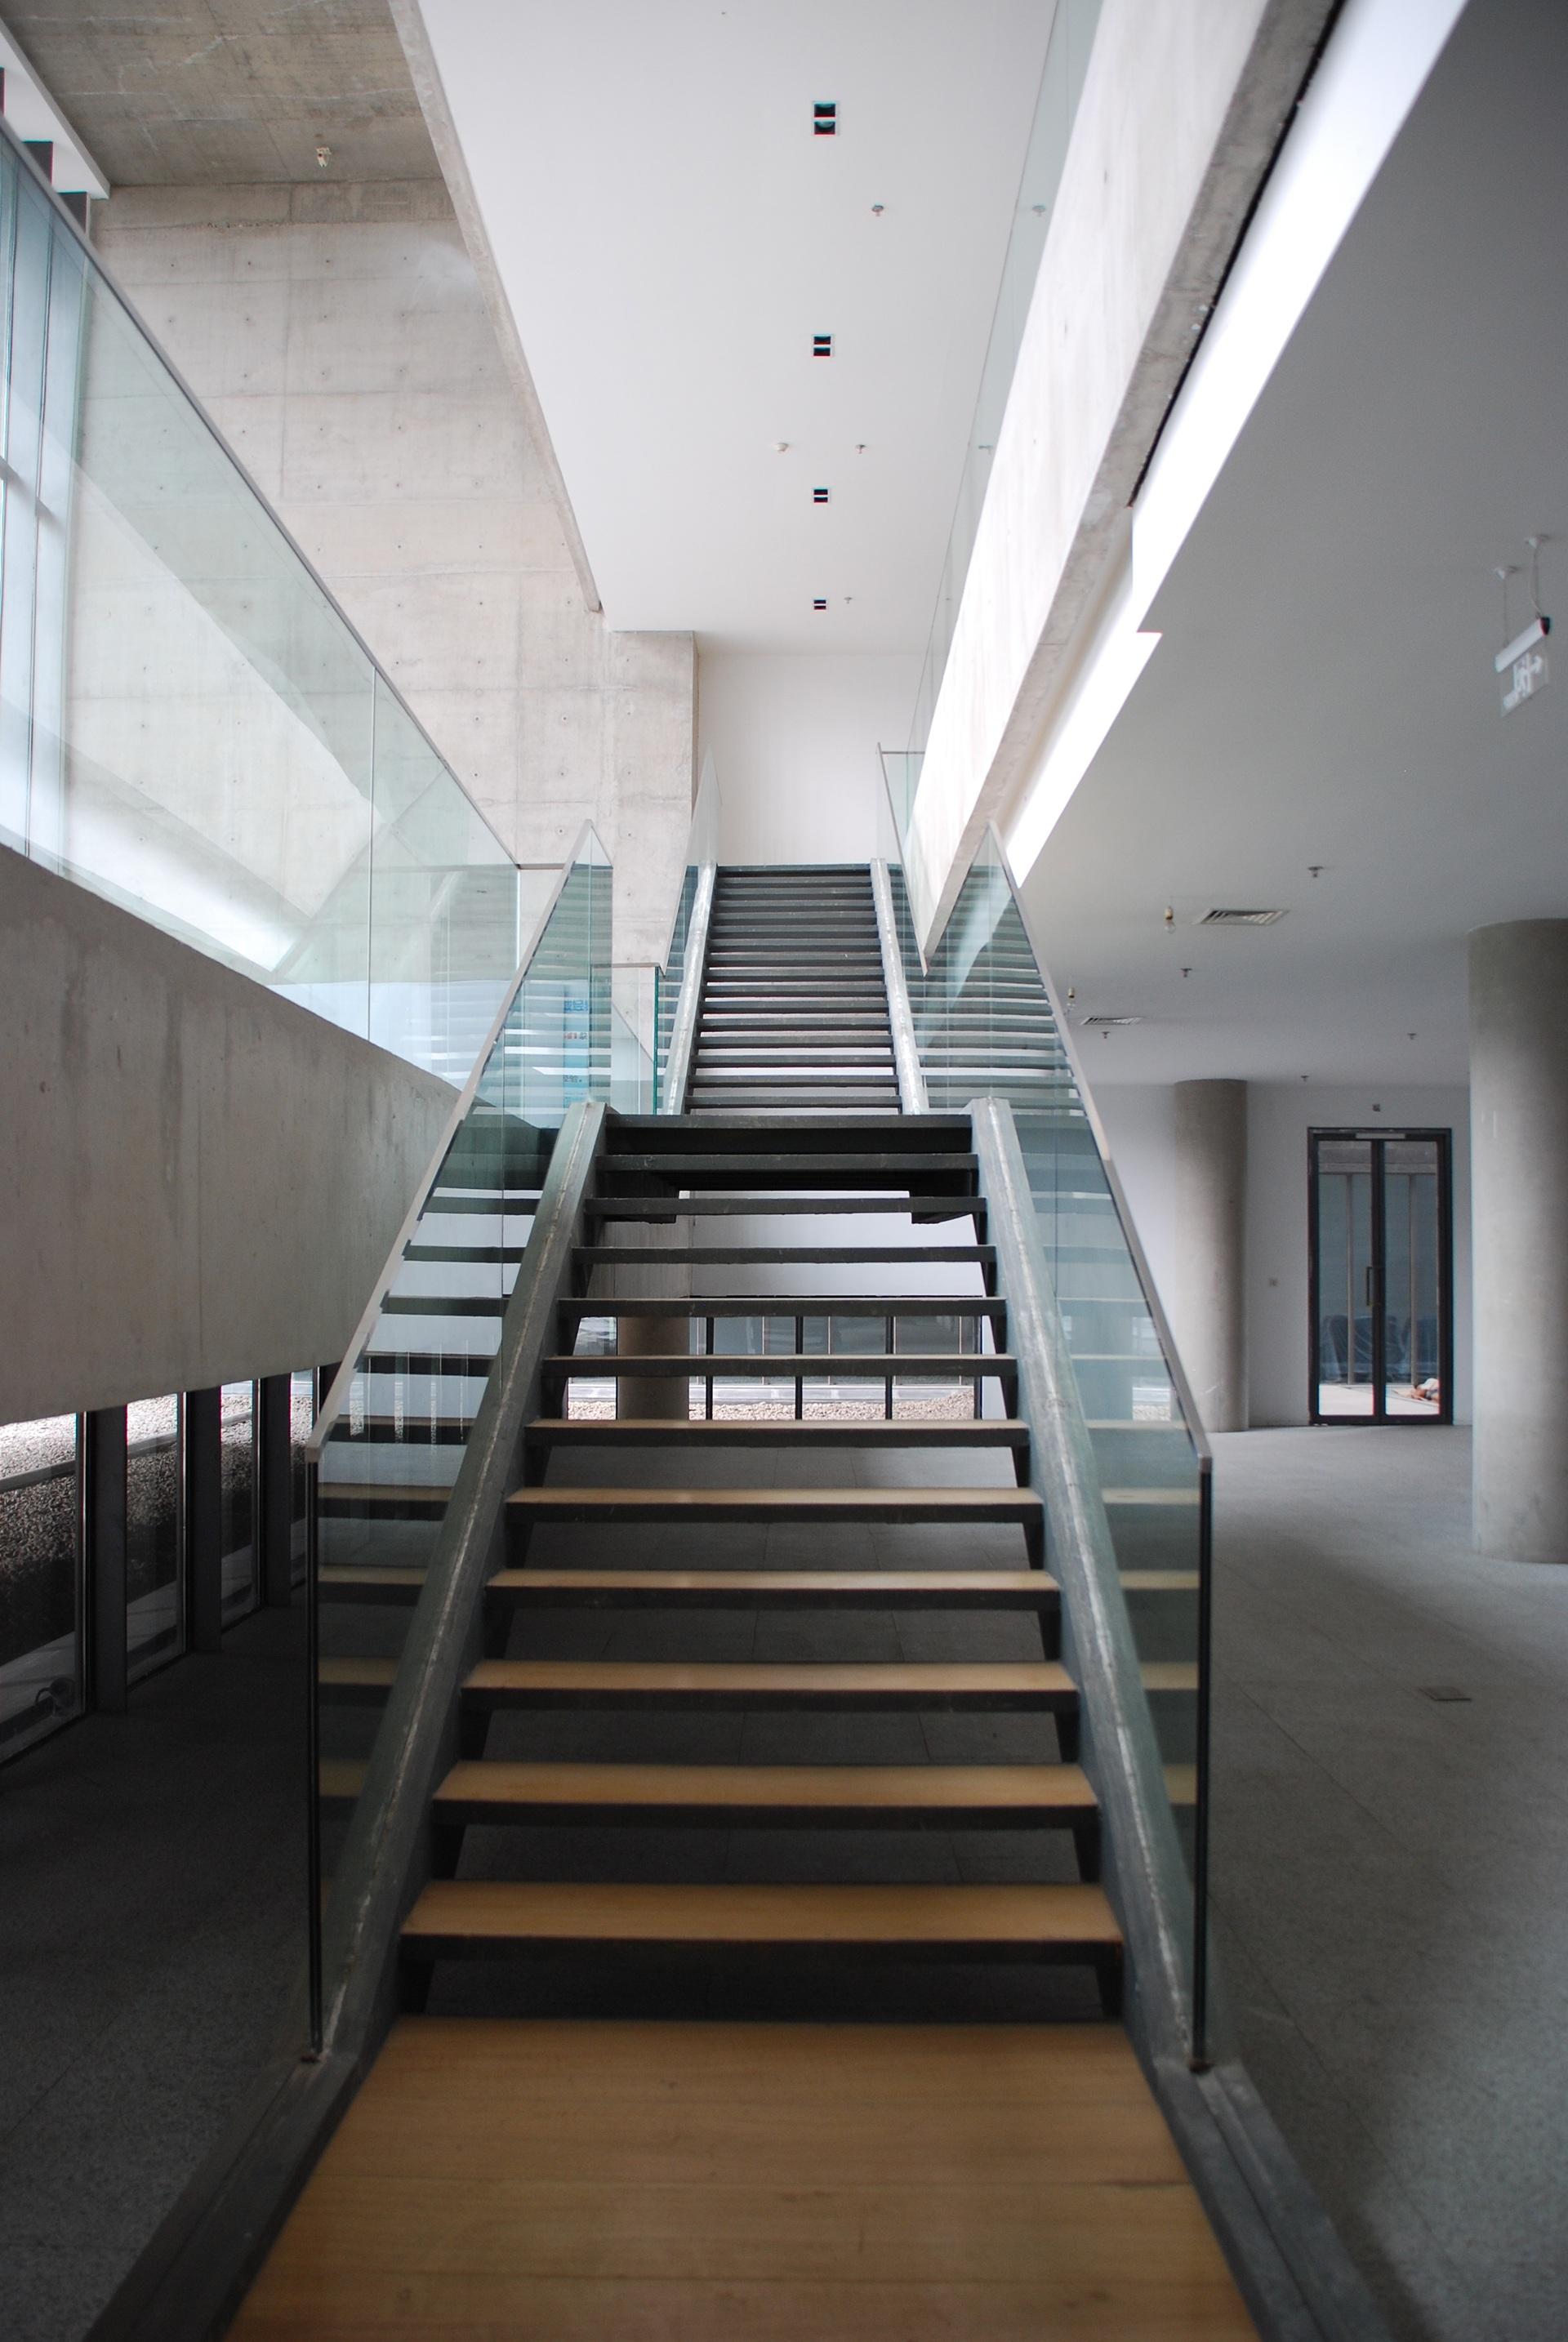 Fotos gratis arquitectura piso edificio sala for Iluminacion escaleras interiores